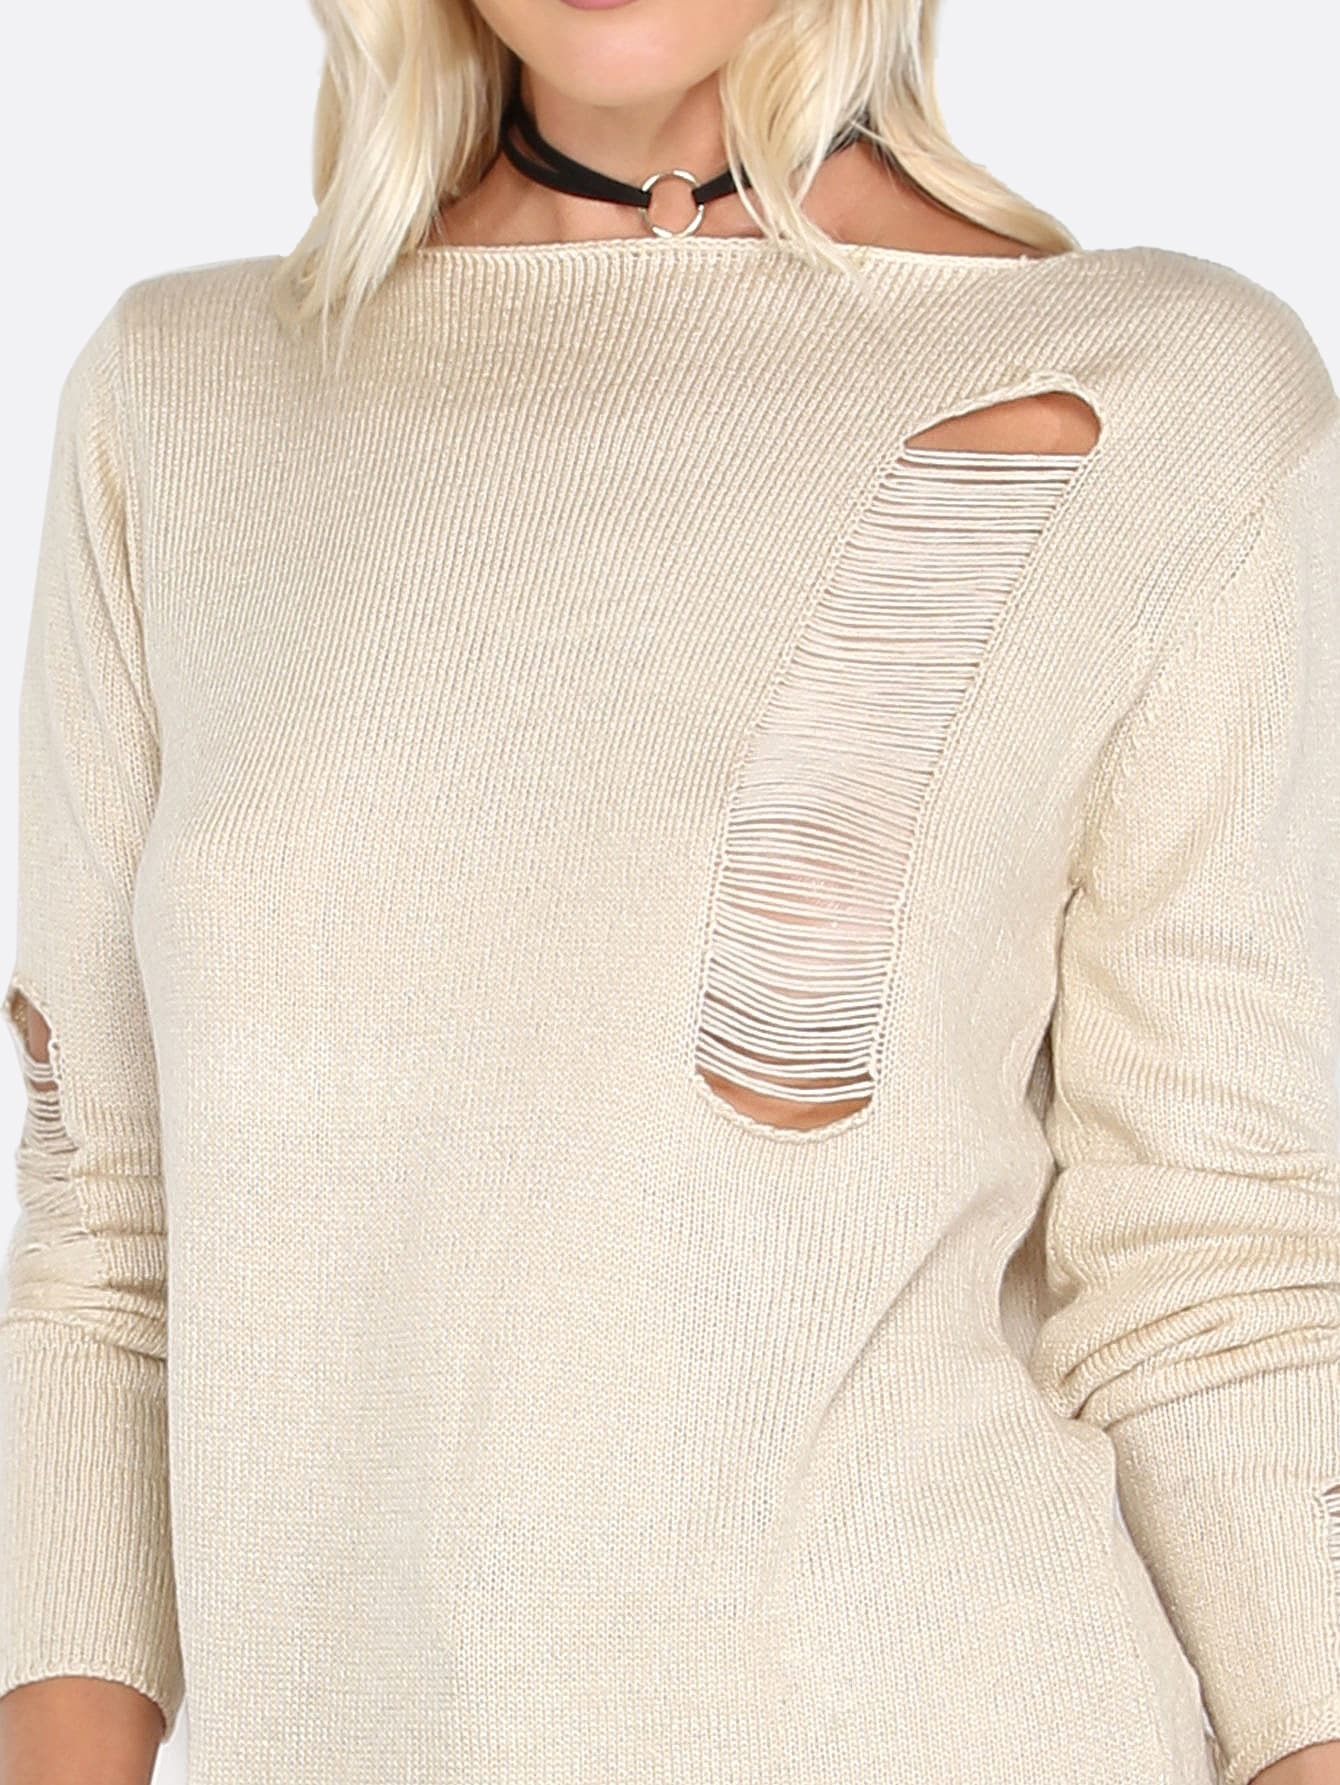 sweater160809701_2